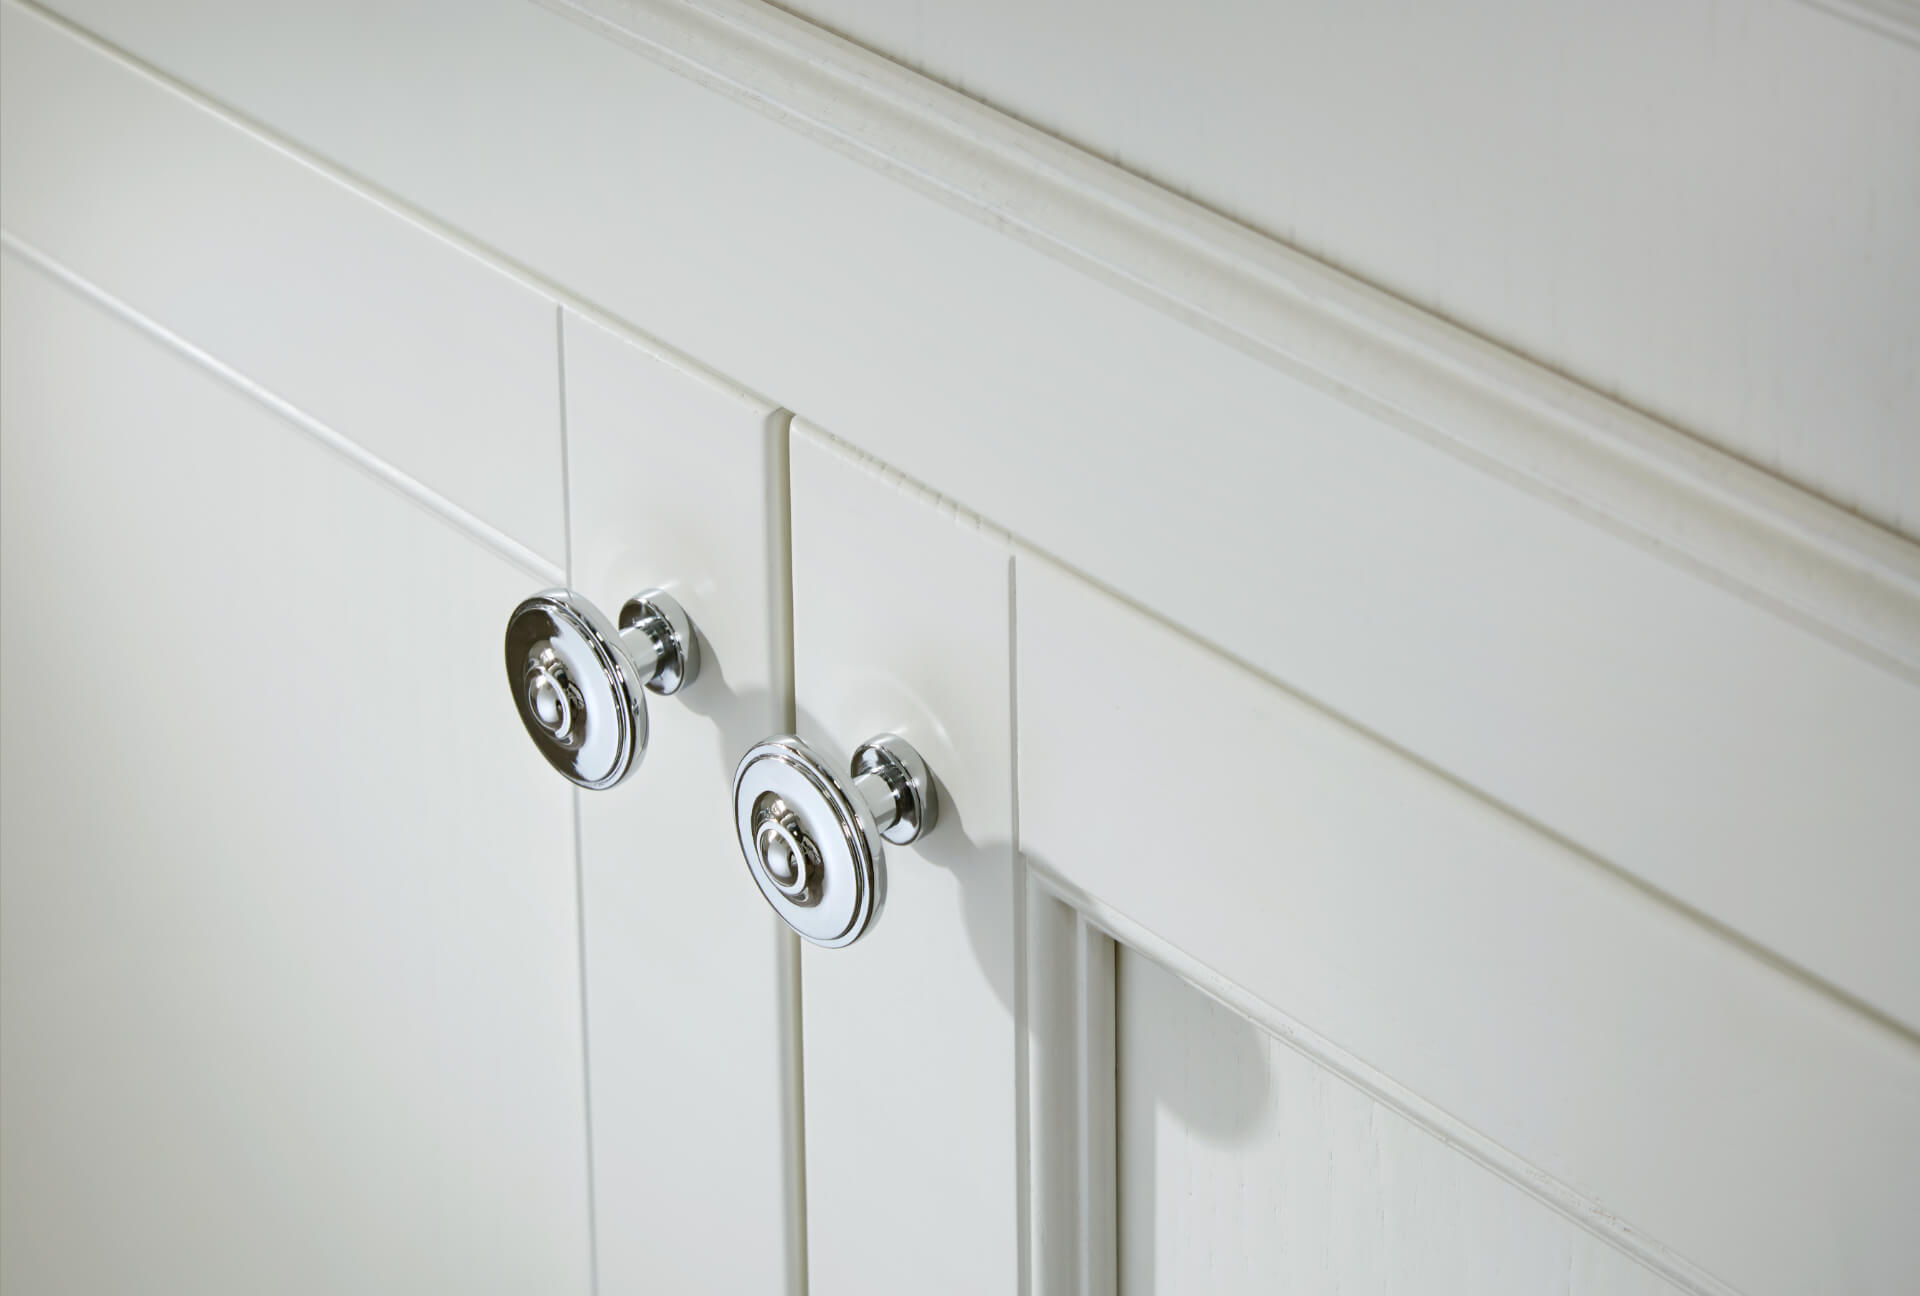 Utopia Bathroom Qube Cabinet Handles